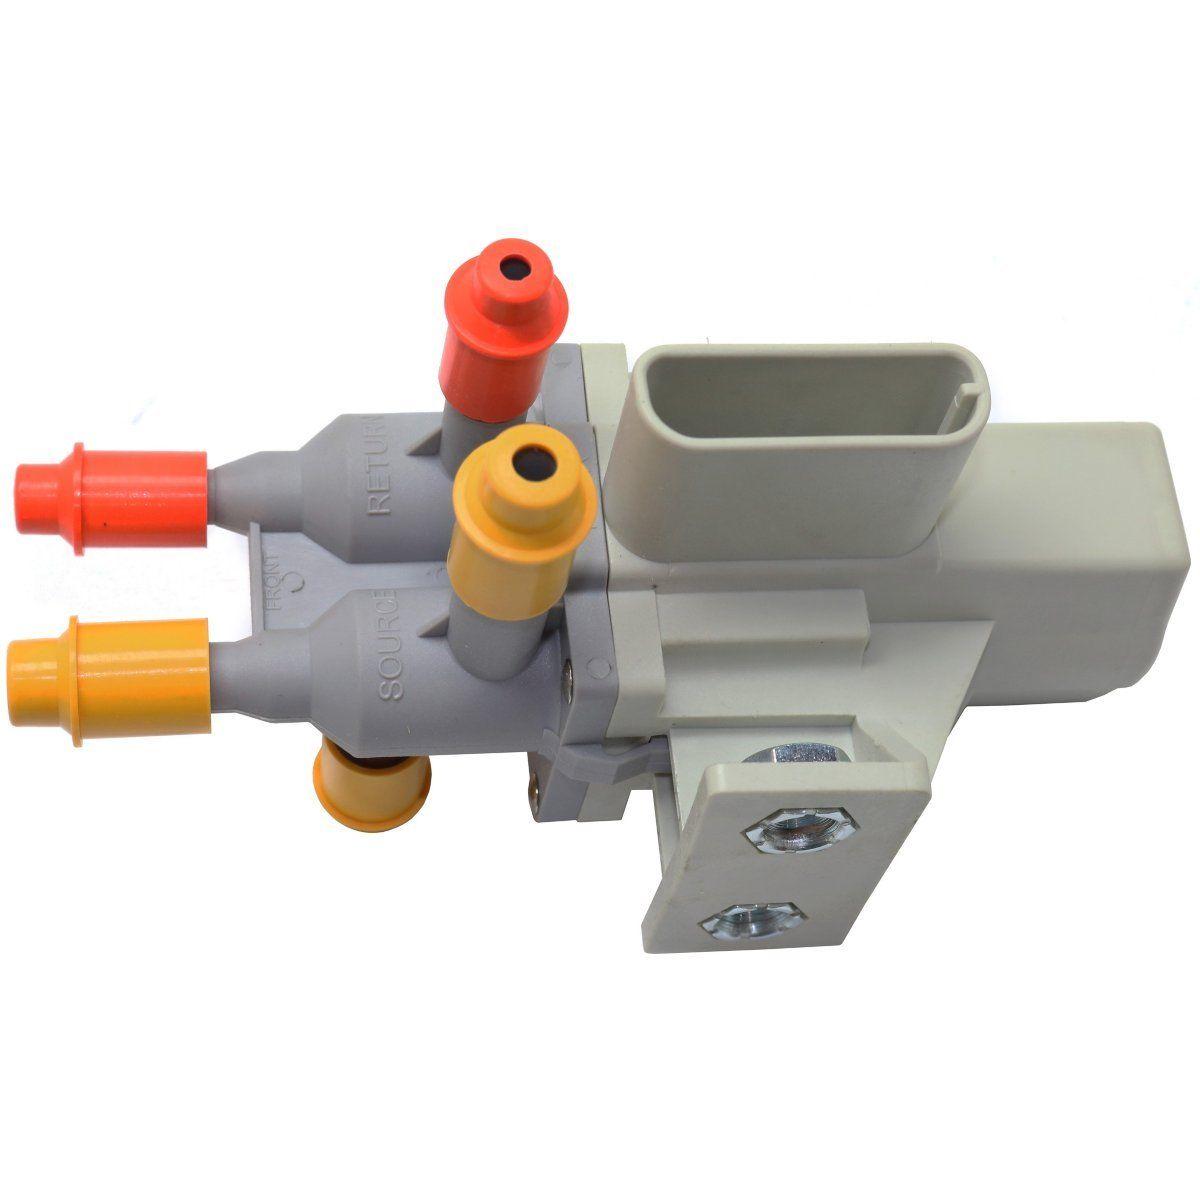 Fuel Tank Selector Valve 6 Port For Ford Super Duty Diesel Engine F250 F350 F450